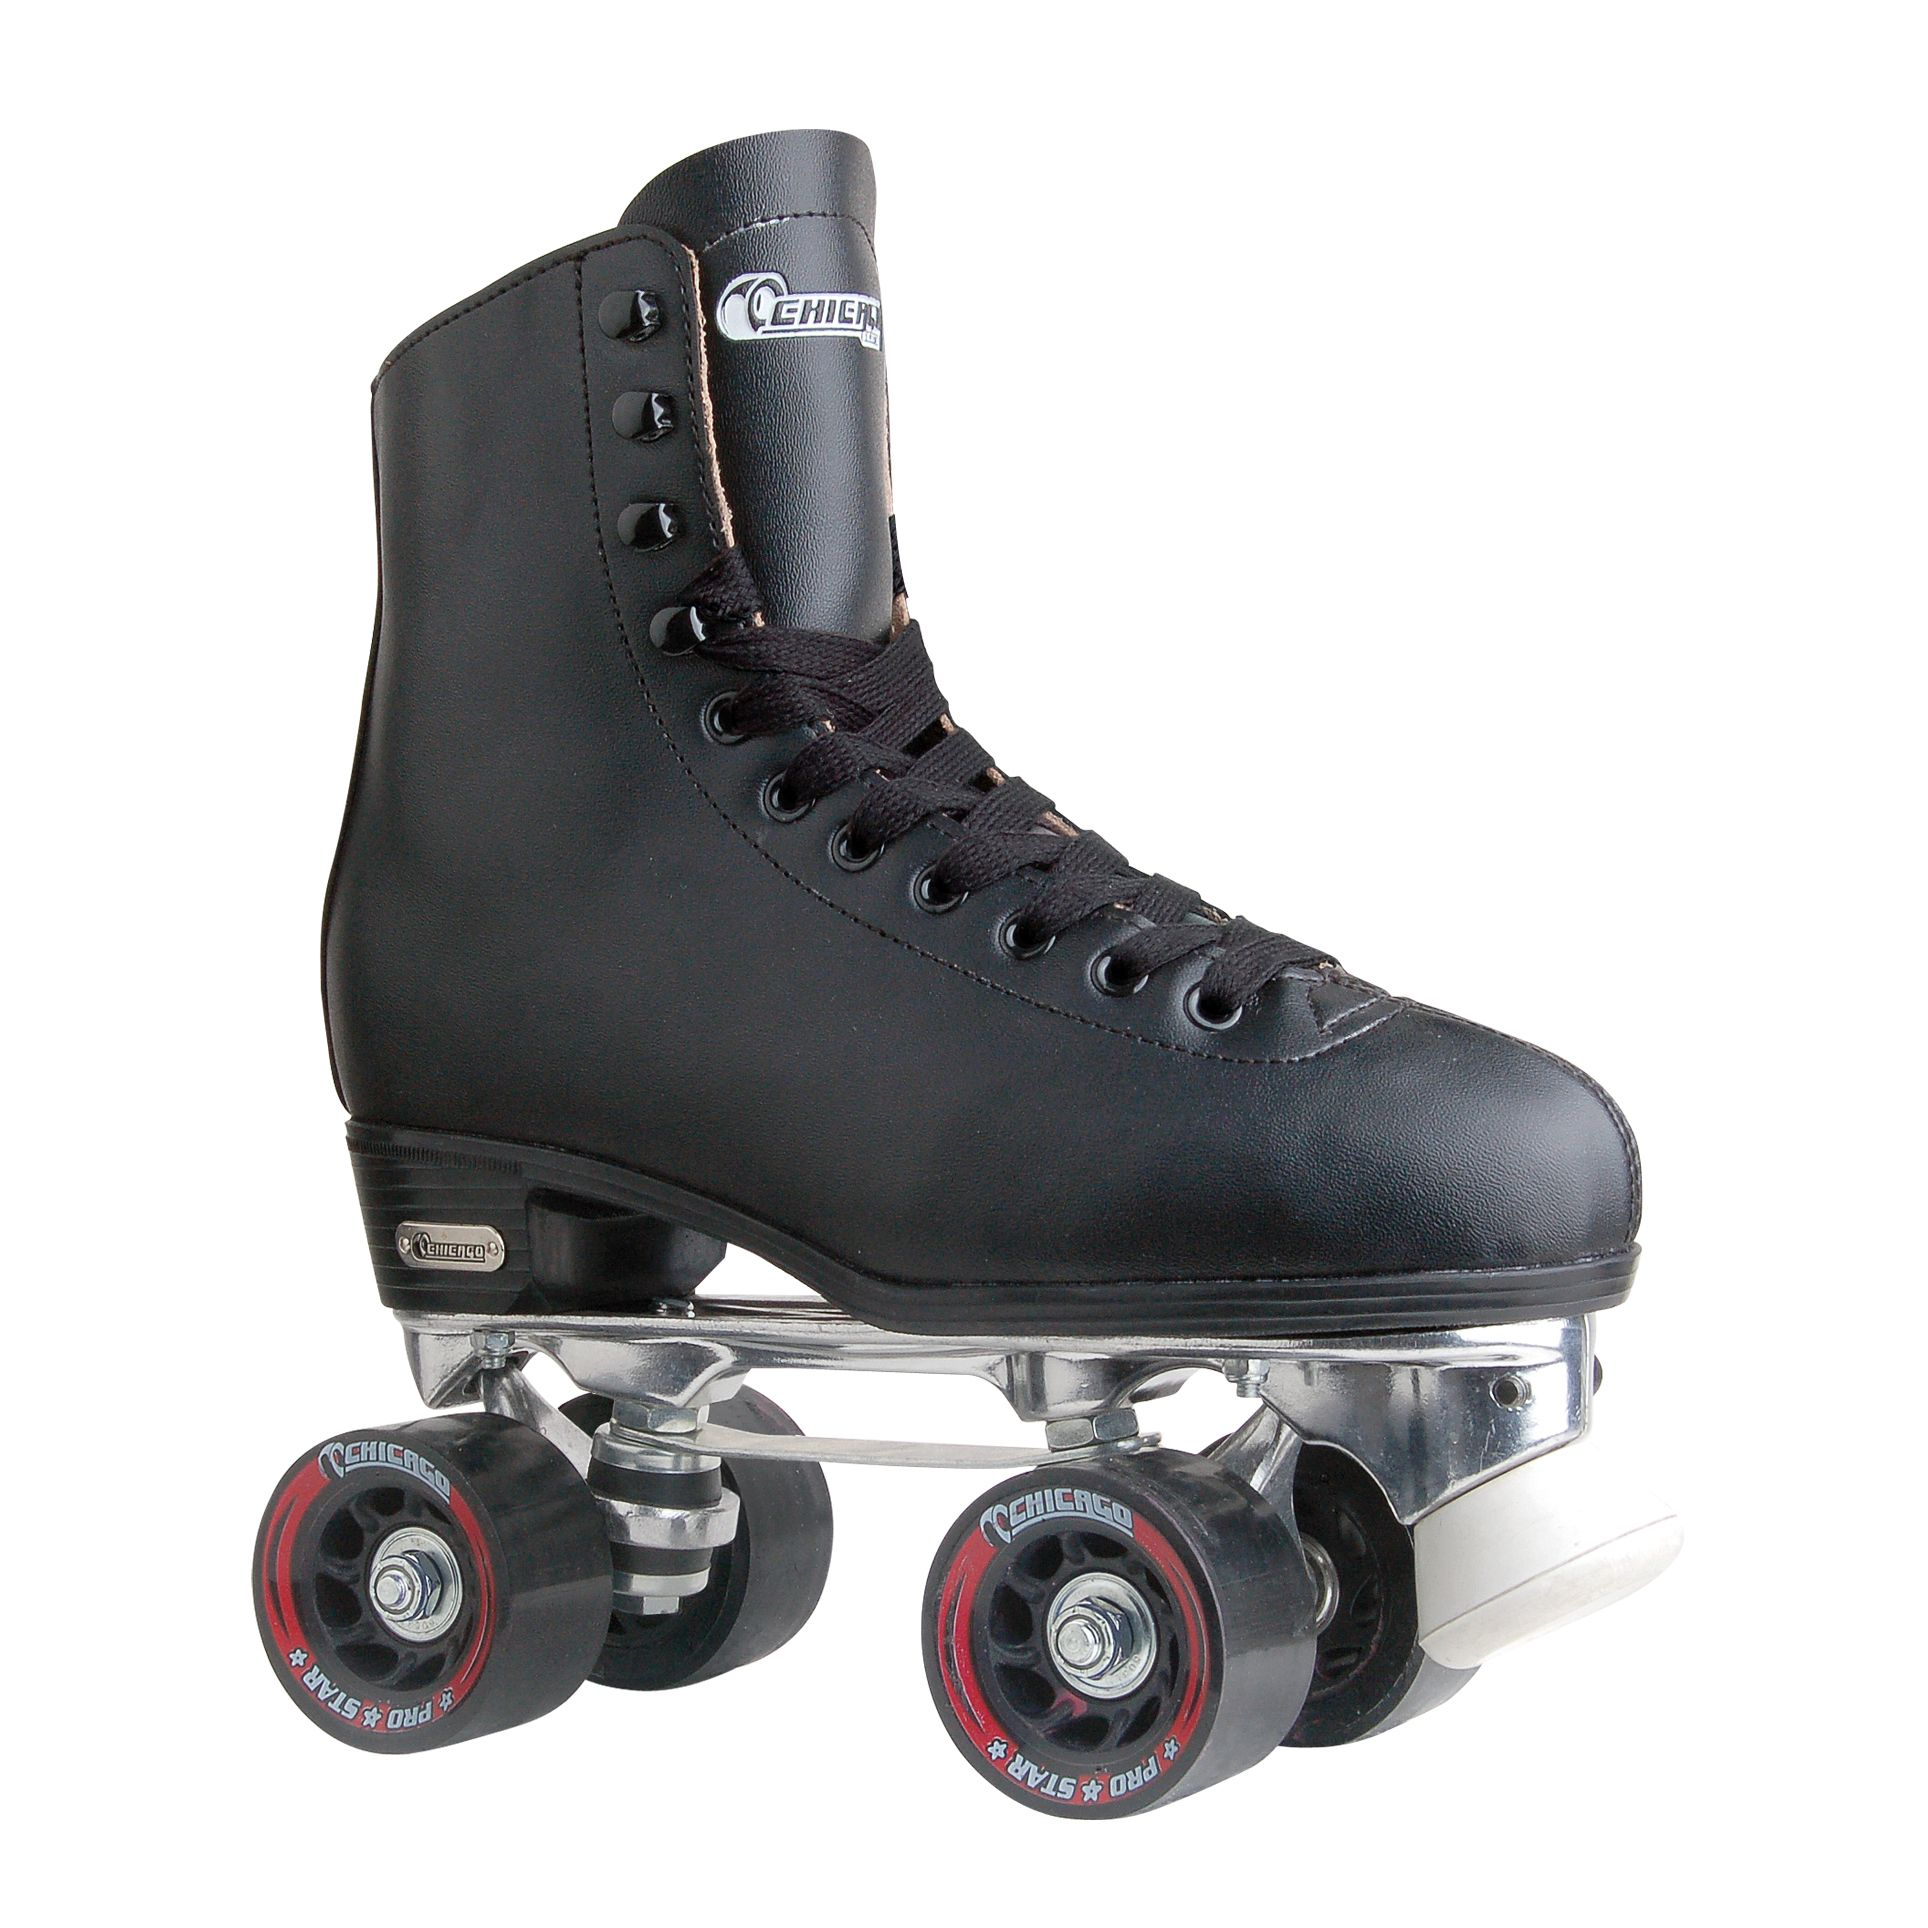 Riedell 111 Fame Roller Skates Traditional High Top Artistic Skate White Wheels